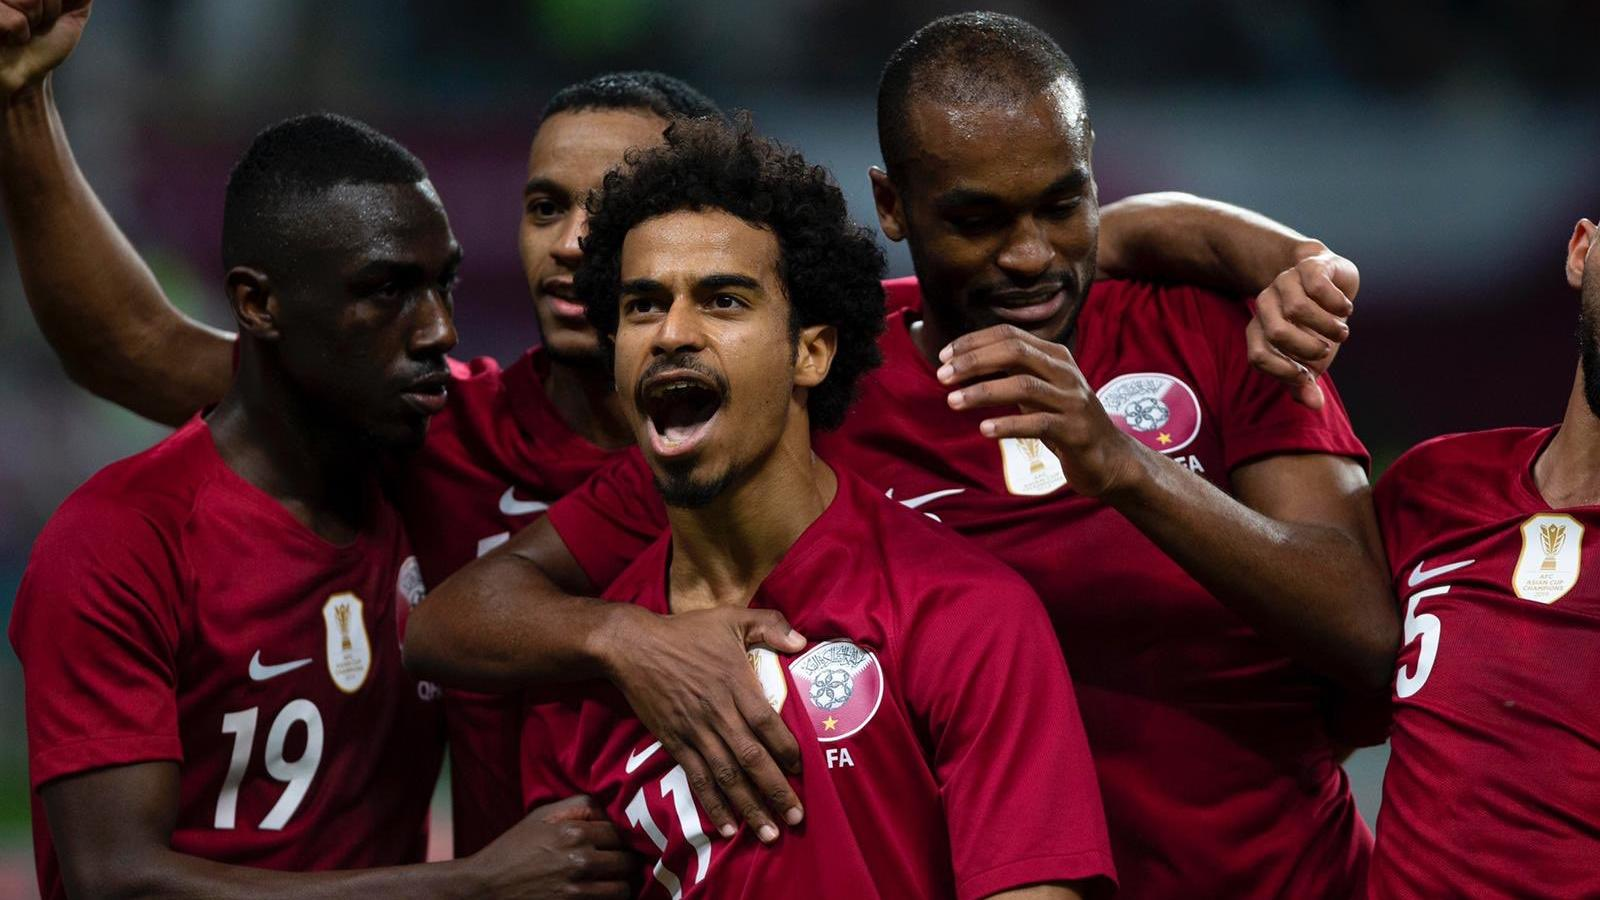 WATCH: Afif shines like a million stars as Qatar pounds UAE 4-2 to earn semis berth